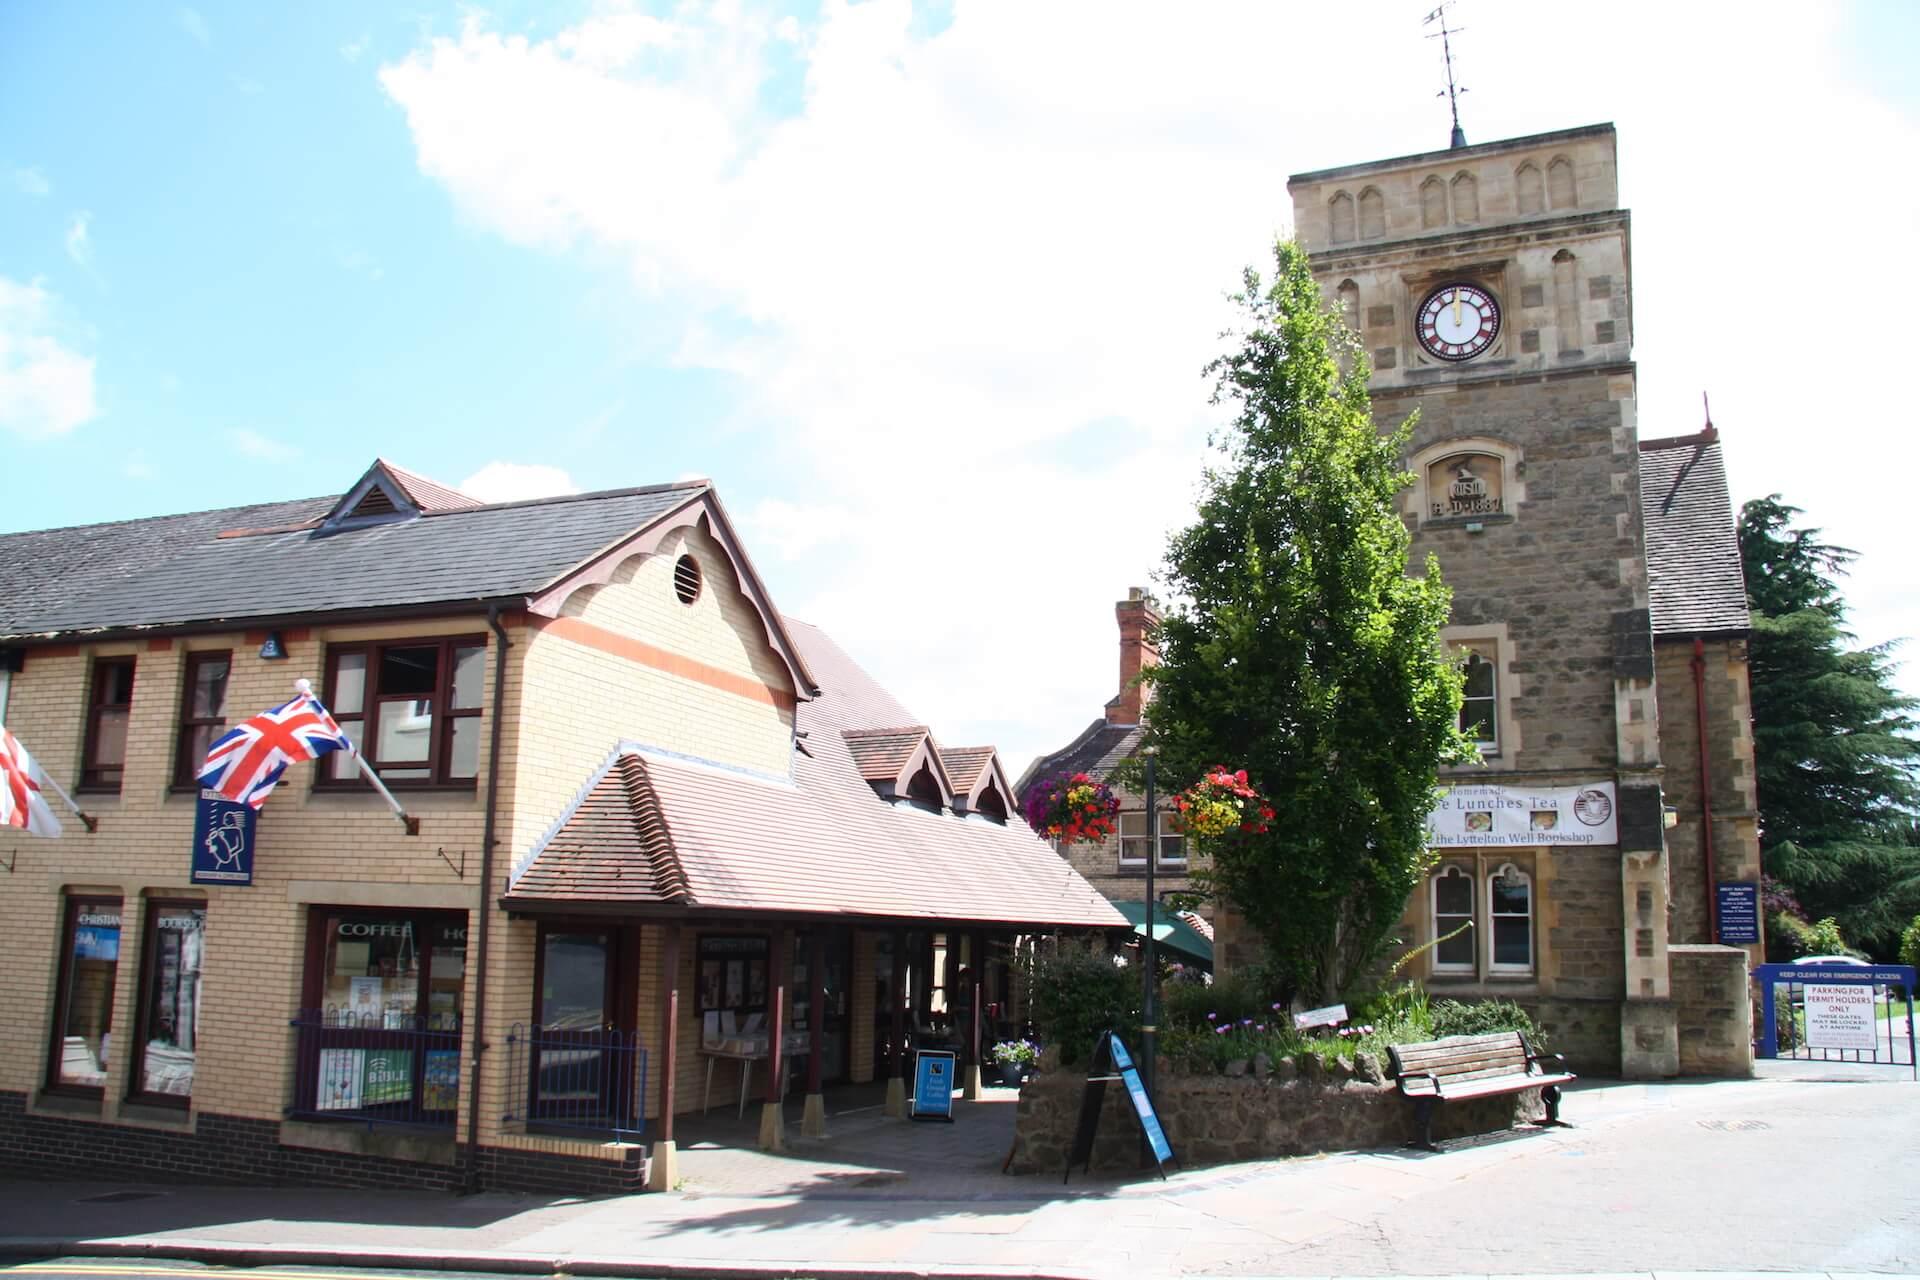 The Lyttelton Well Cafe